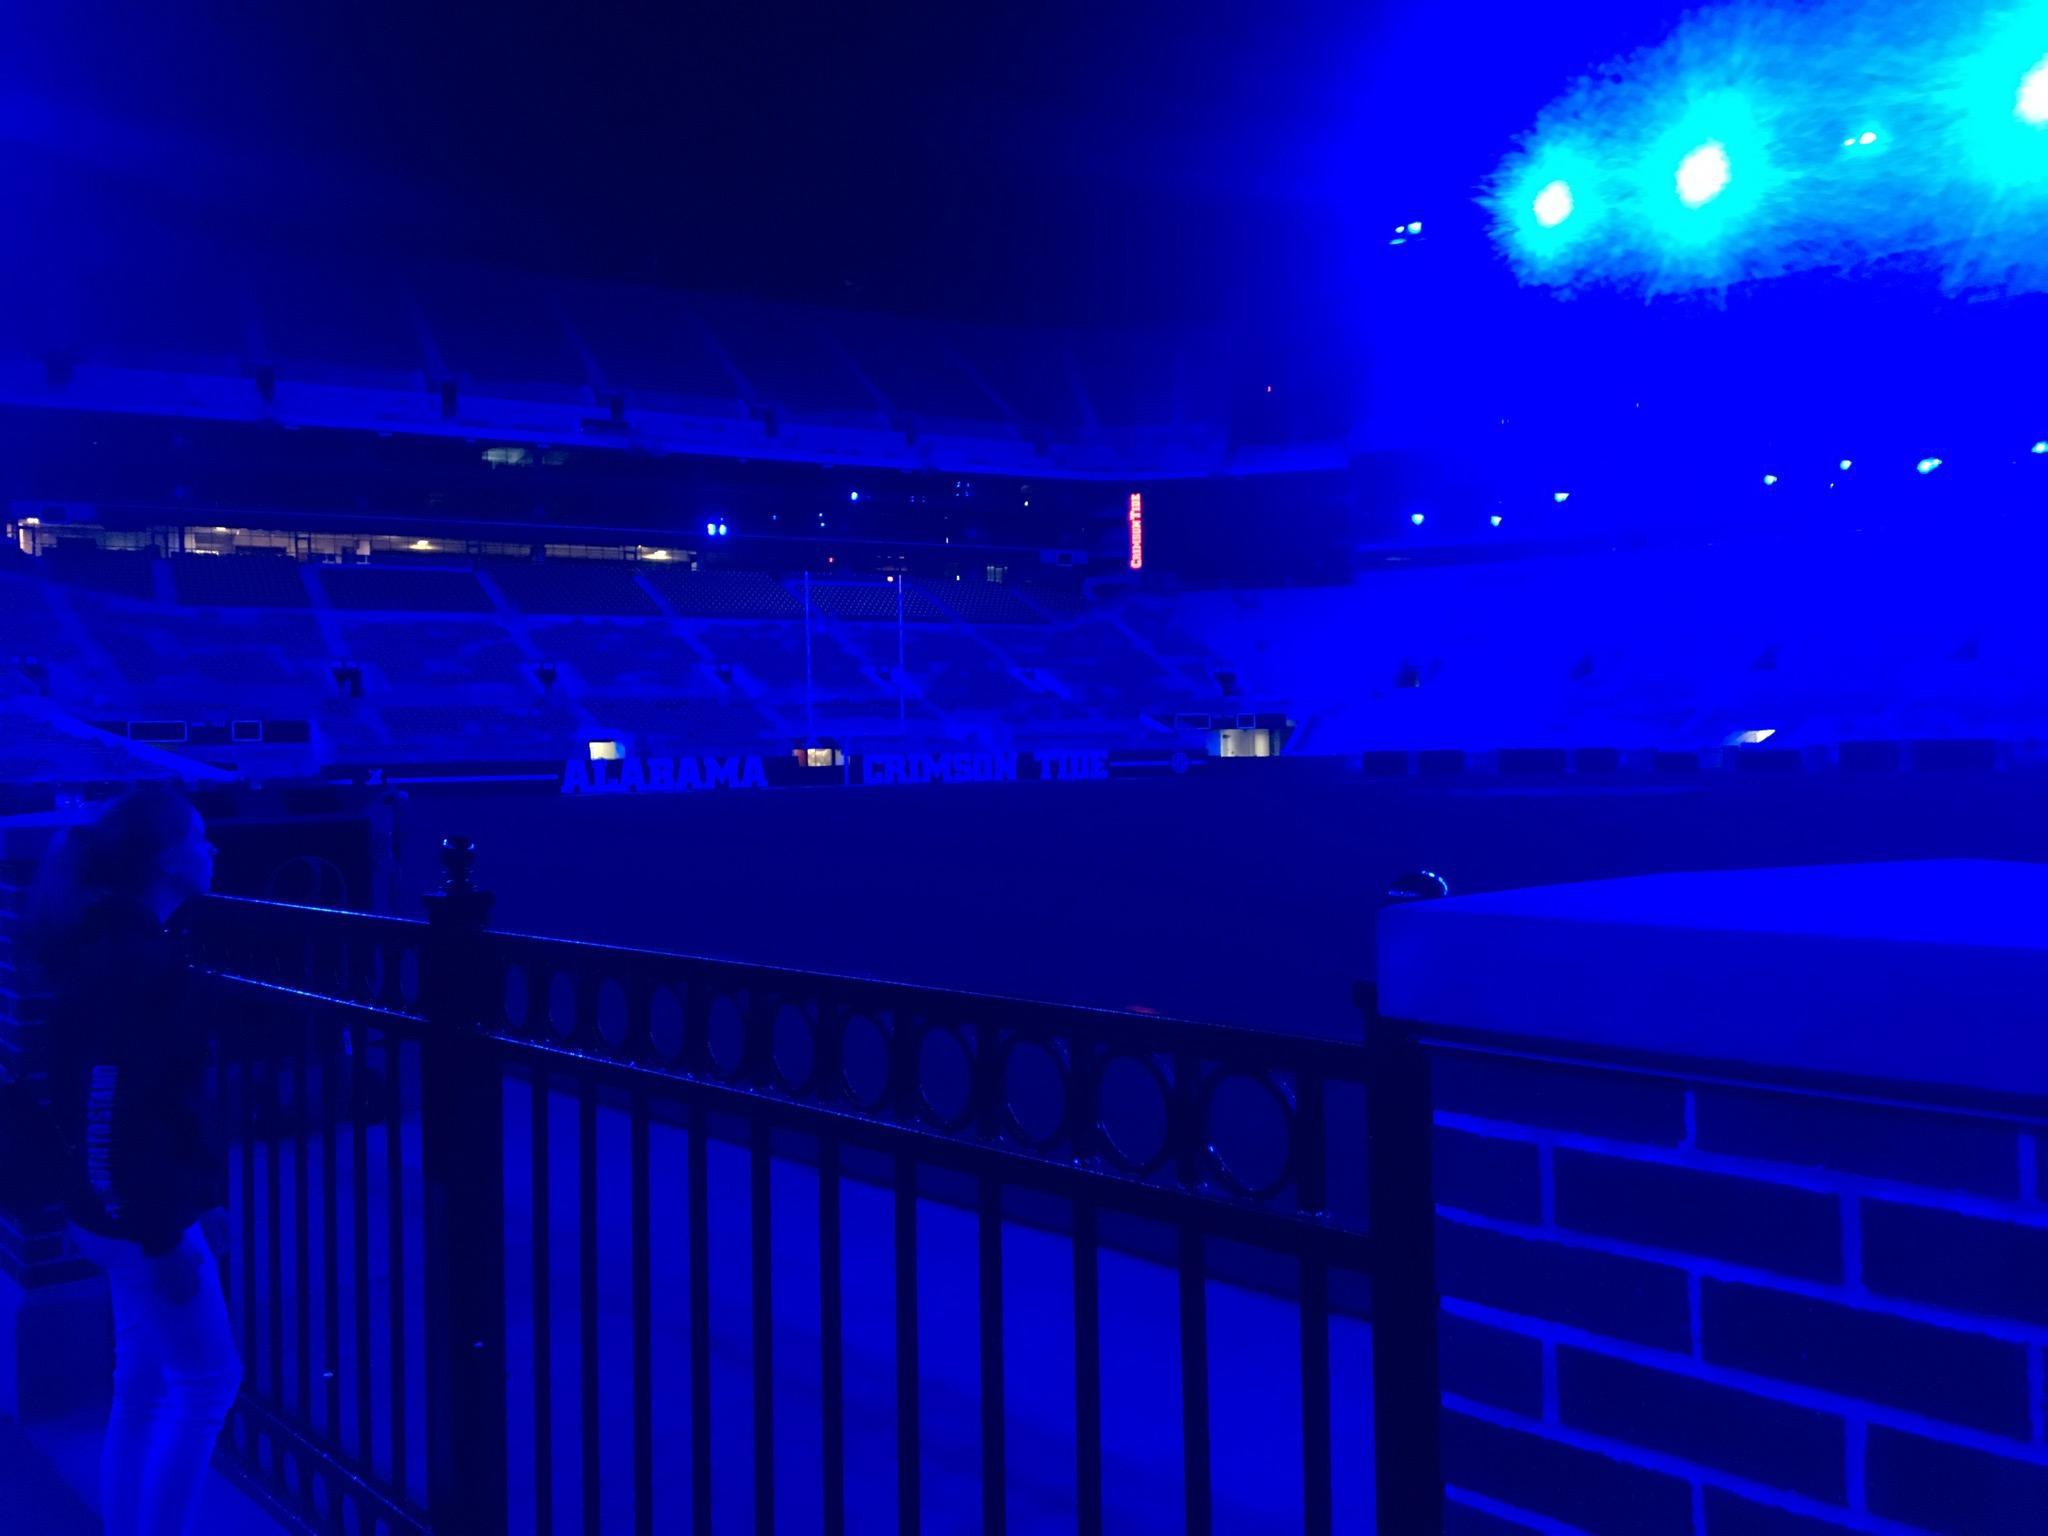 Bryant-Denny Stadium turns blue for slain Tuscaloosa police officer